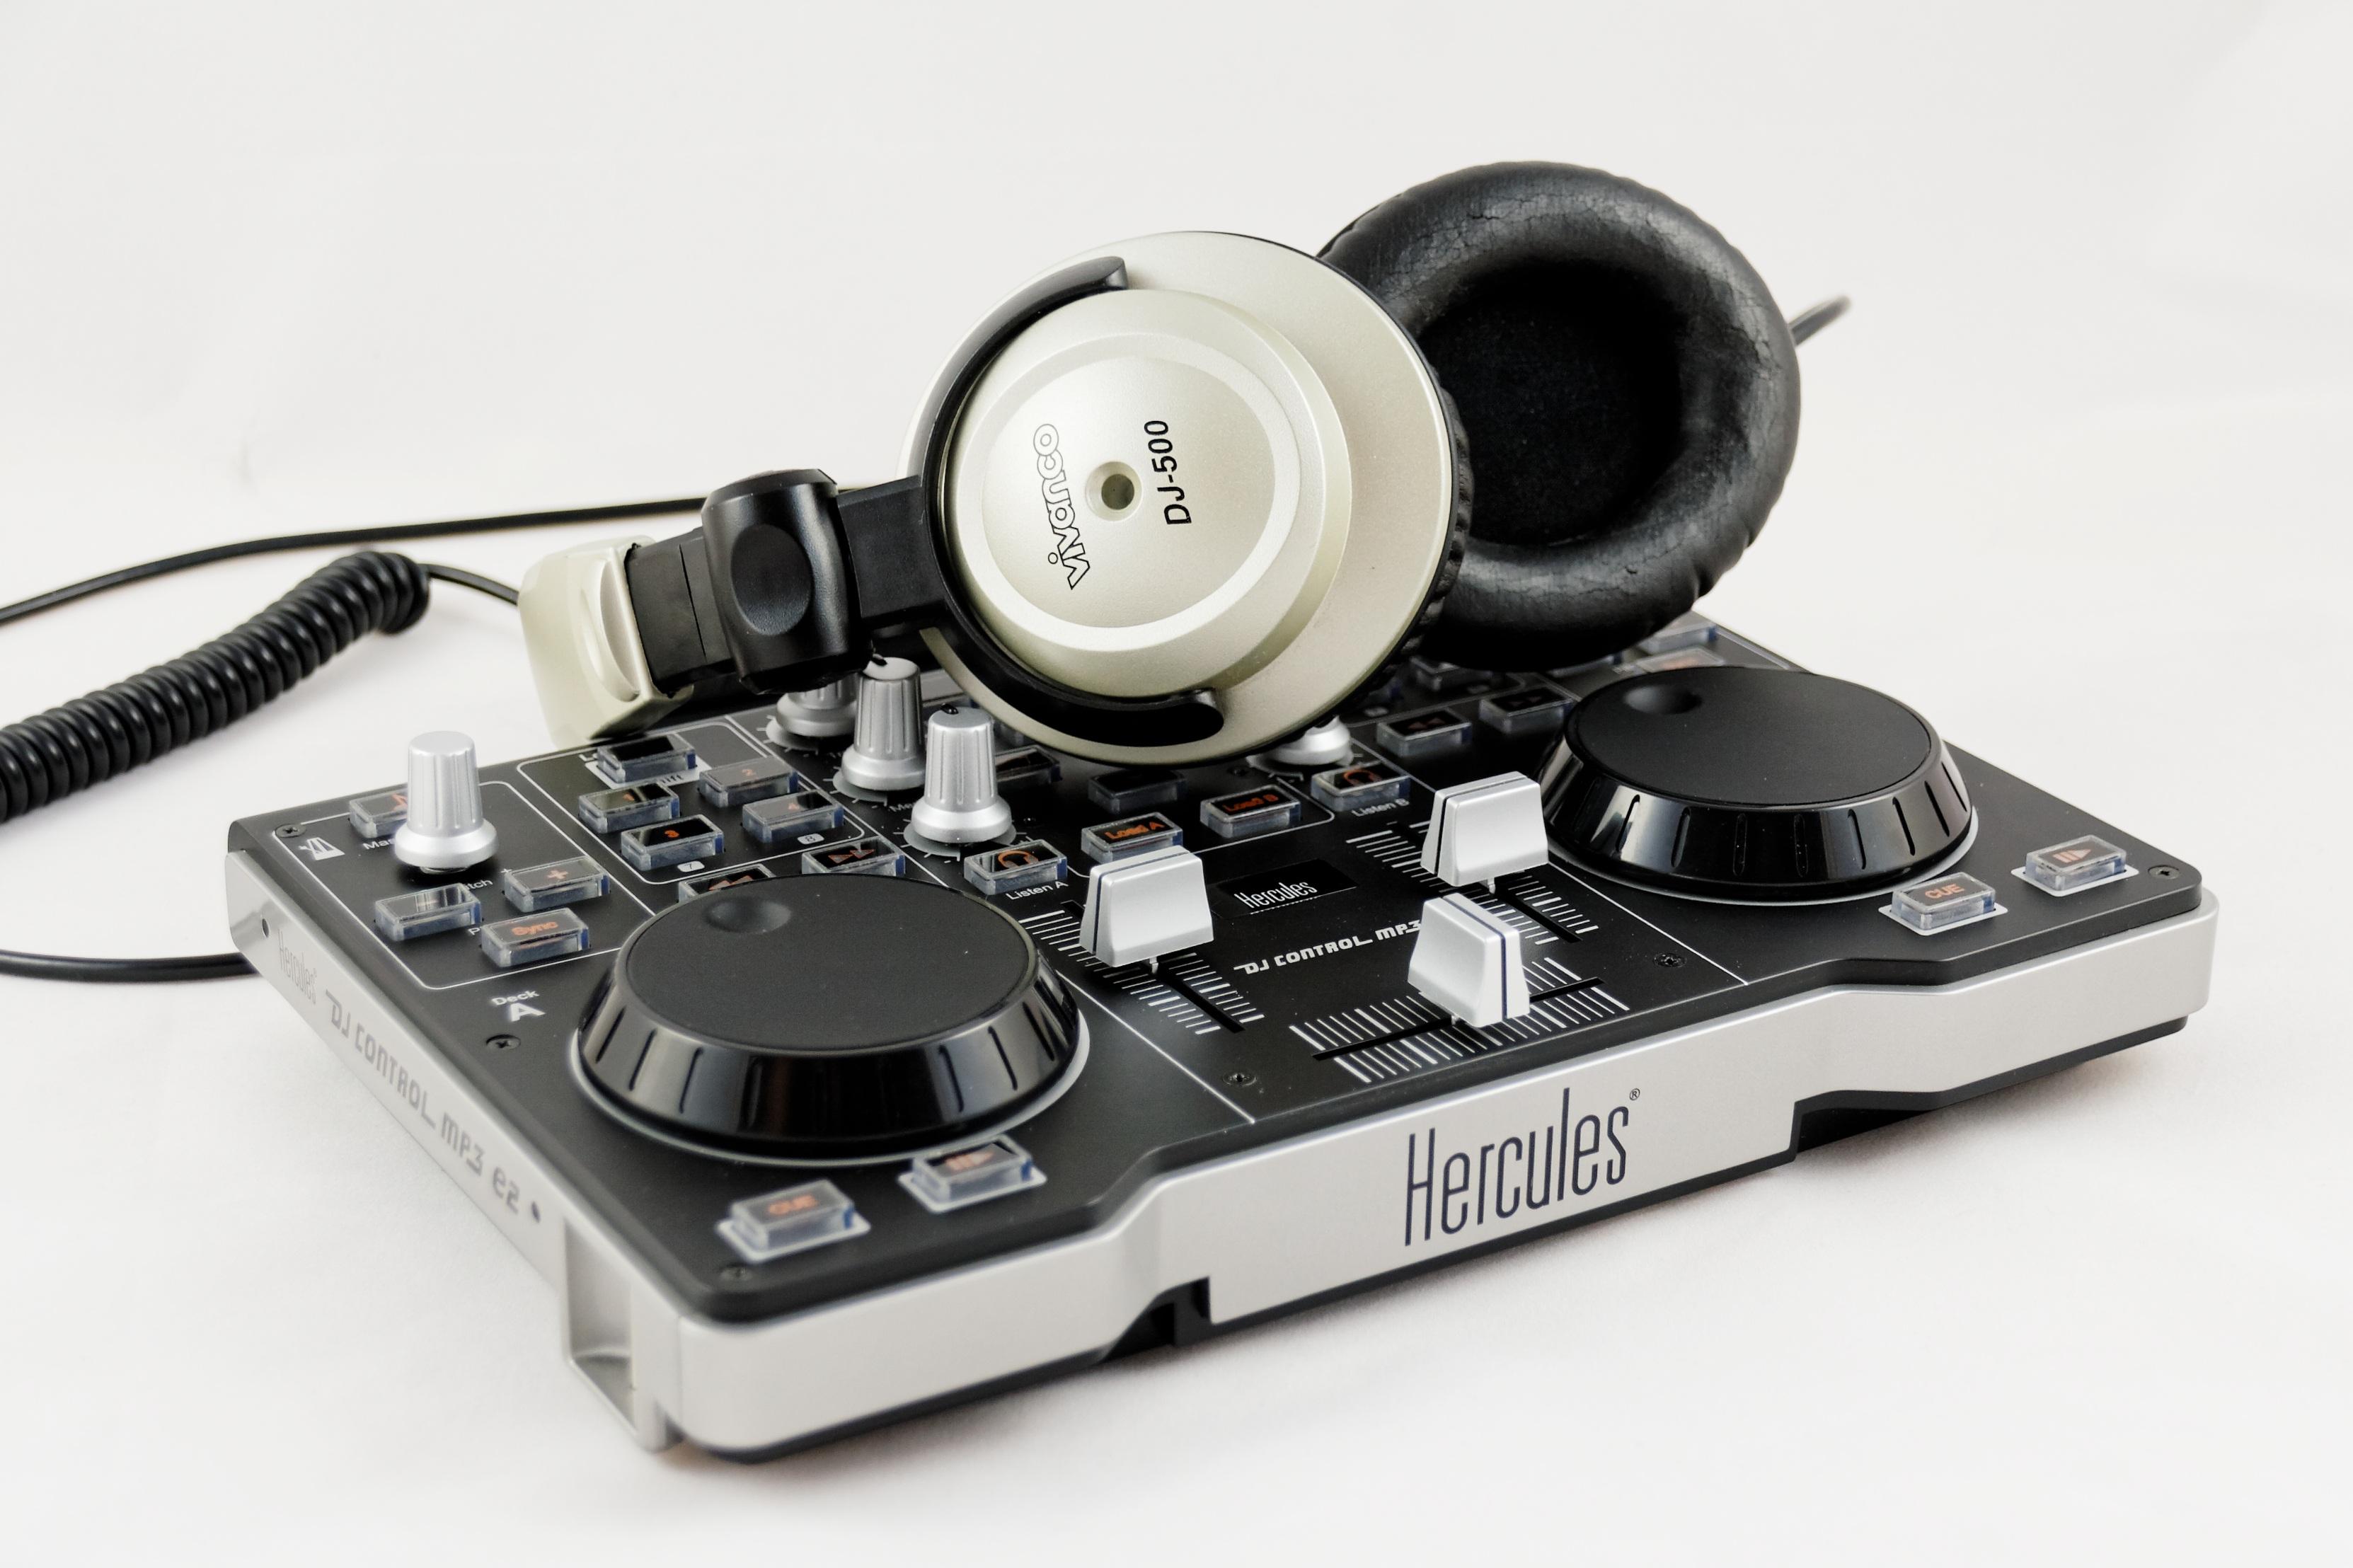 Free images: music, technology, joystick, dj, product.